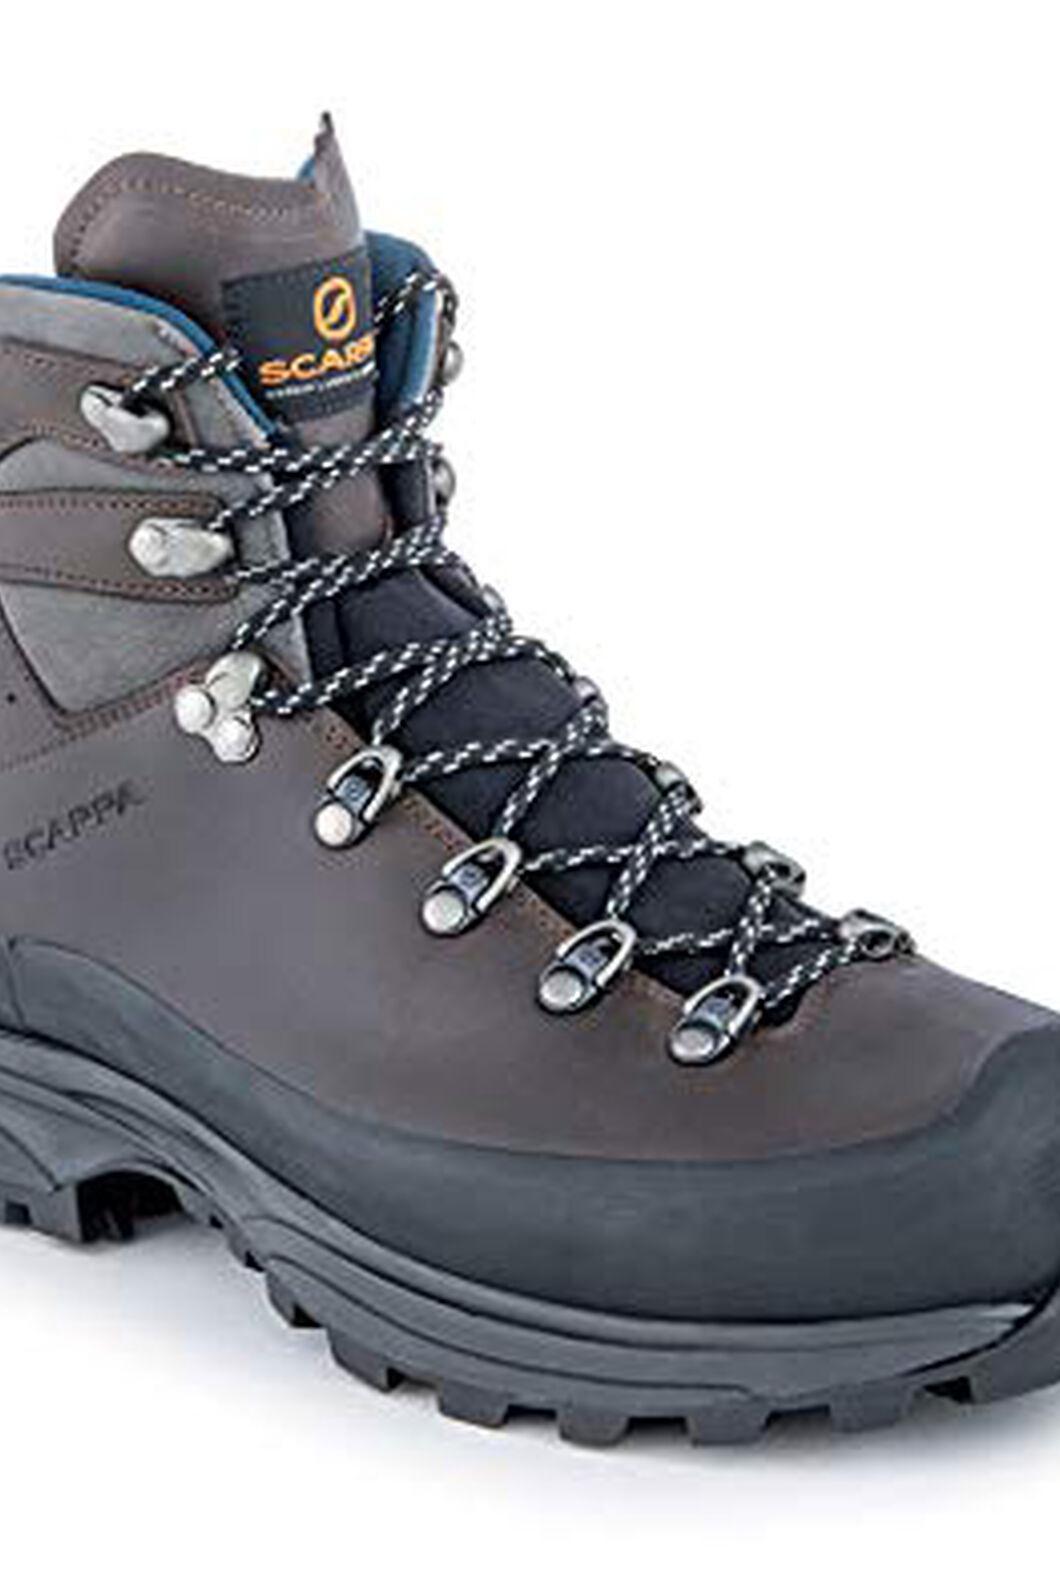 41d9aa20147 Scarpa R-Evolution Active GTX Boots